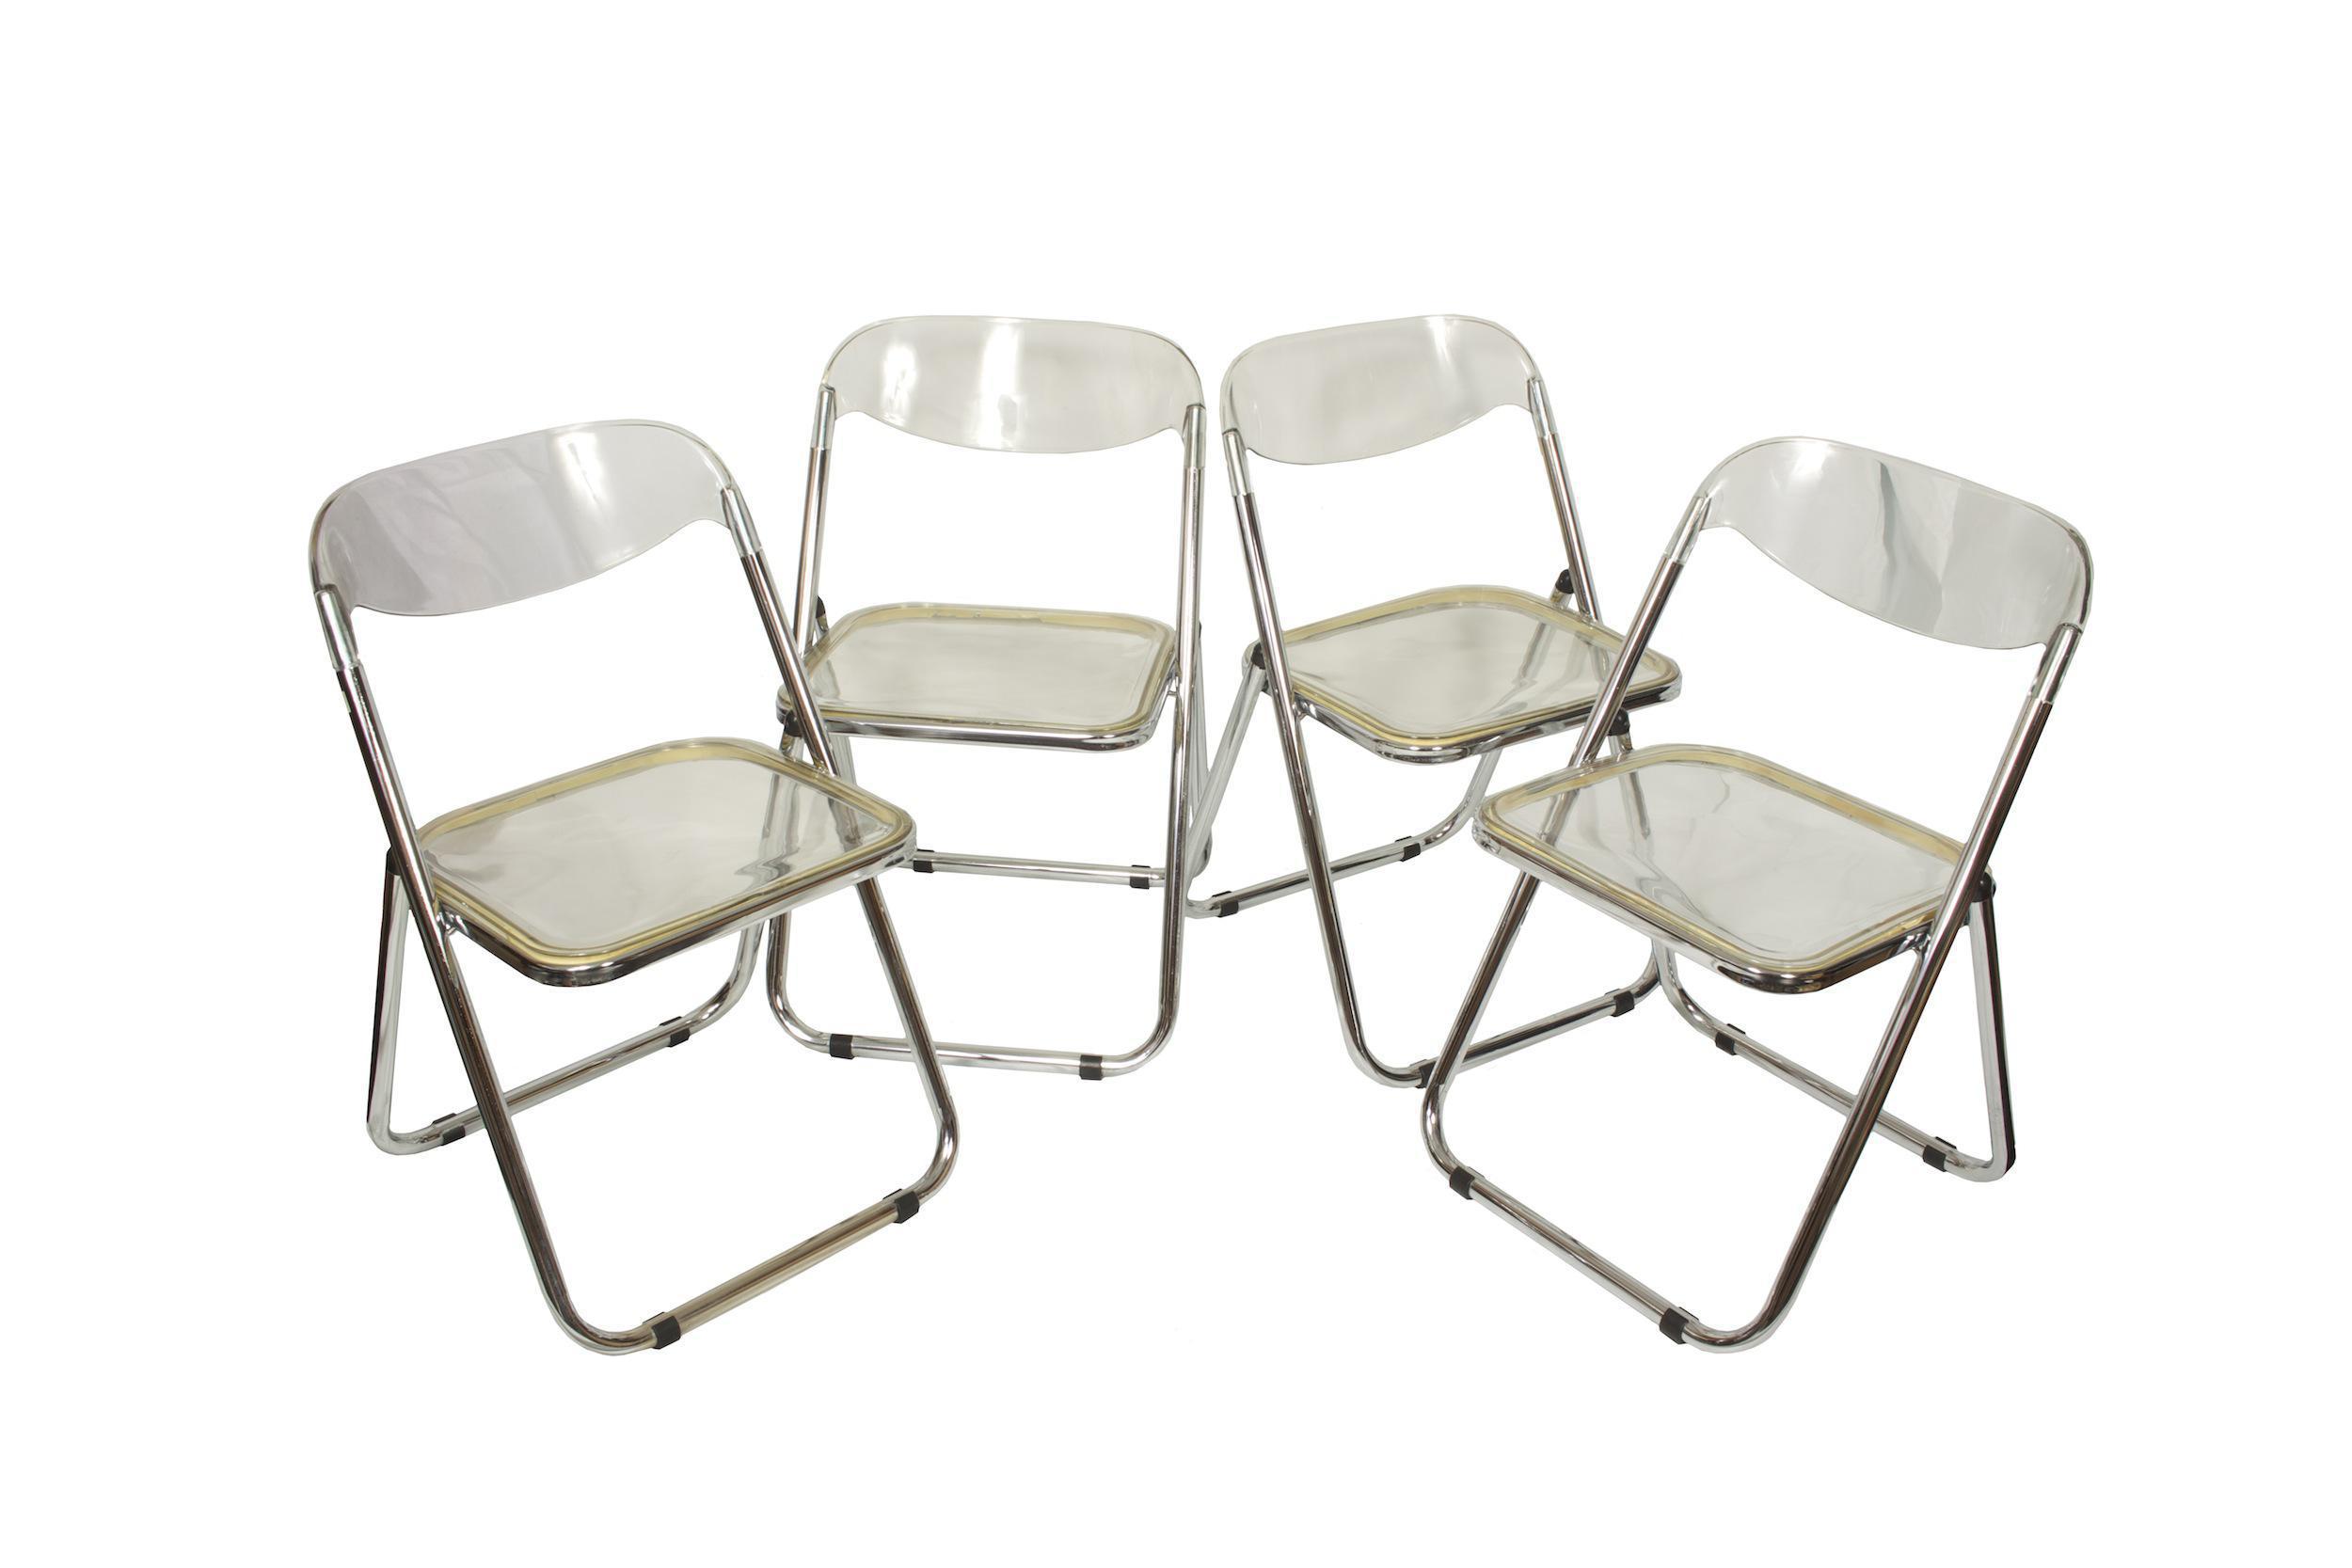 Italian Mid Century Lucite Folding Chairs   Set Of 4